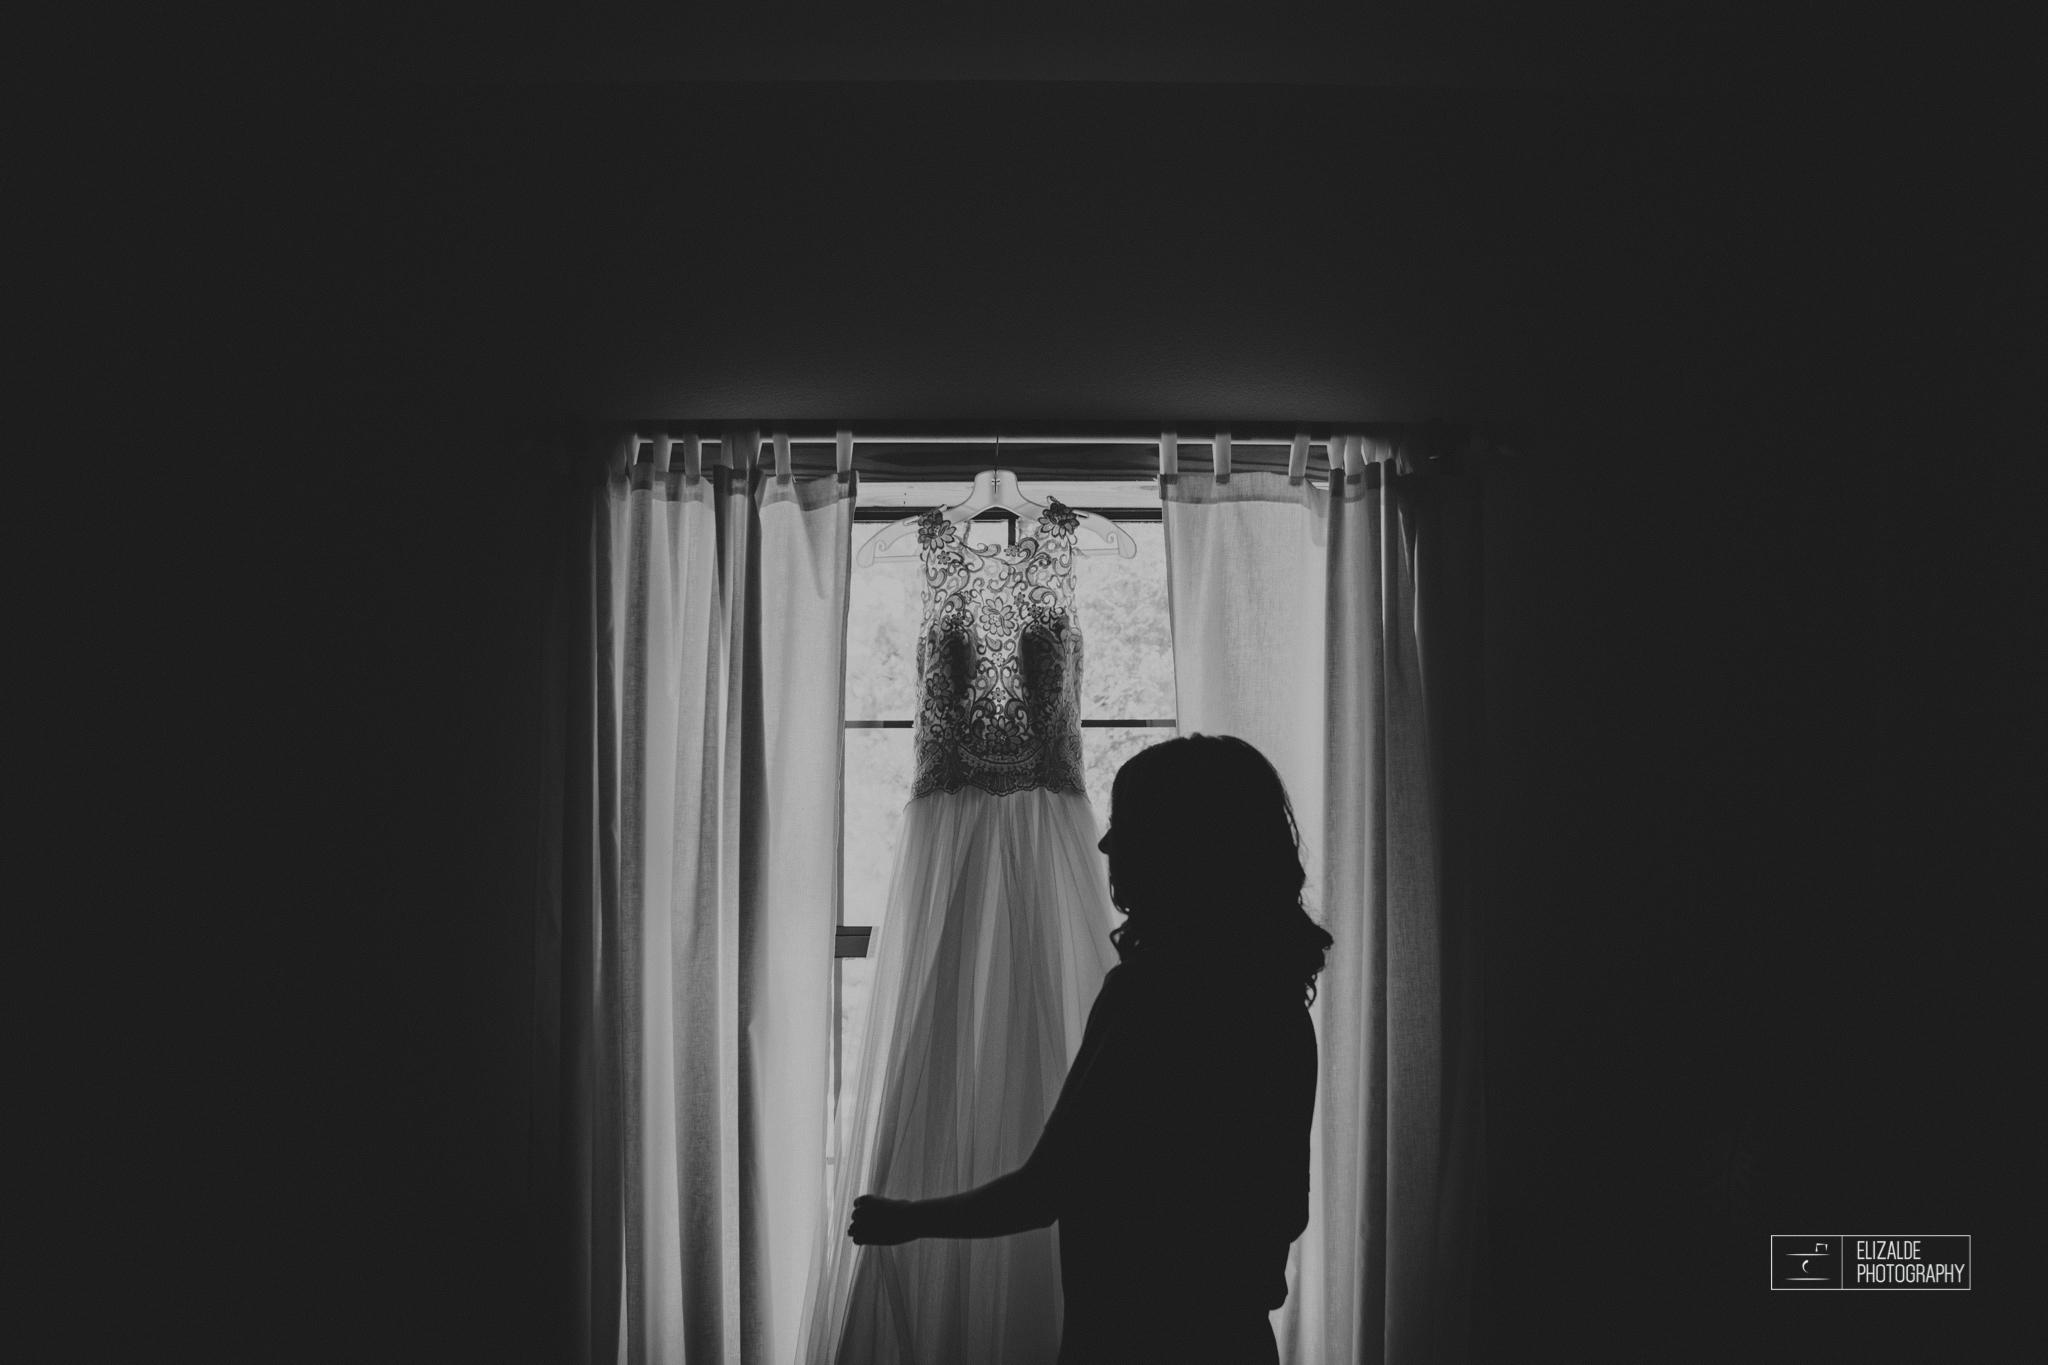 Wedding photographer Dallas_Elizalde Photography_DFW Wedding photographer_ Hickoty Hills_Wedding Photography (14 of 90).jpg